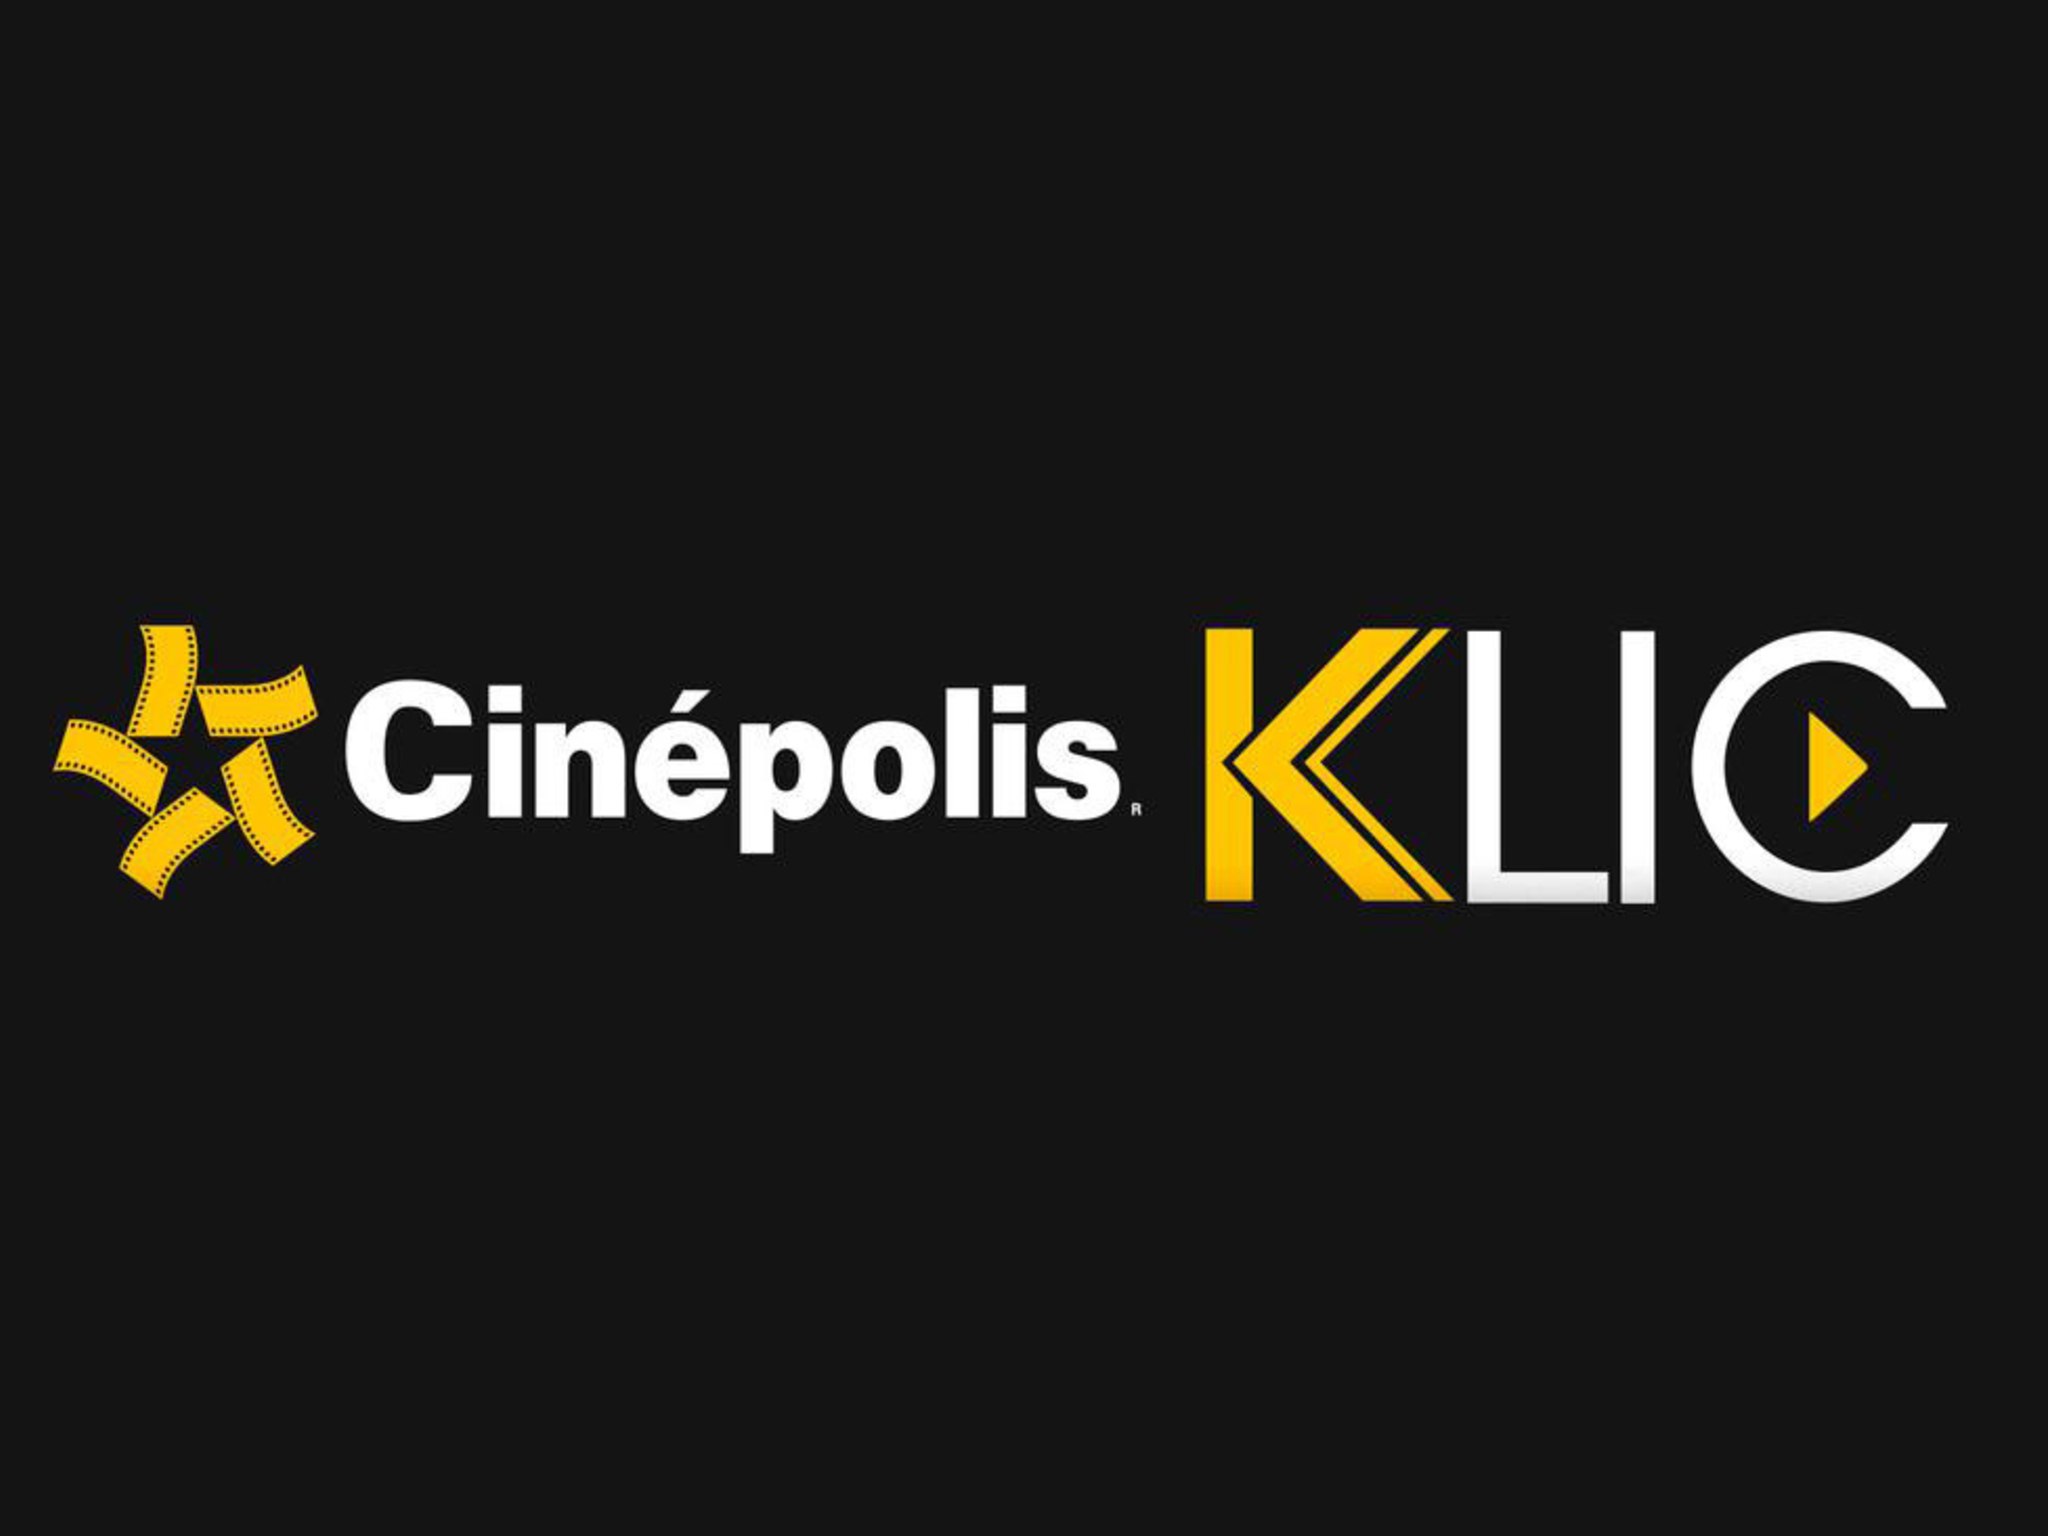 Cinepolis Klic logo